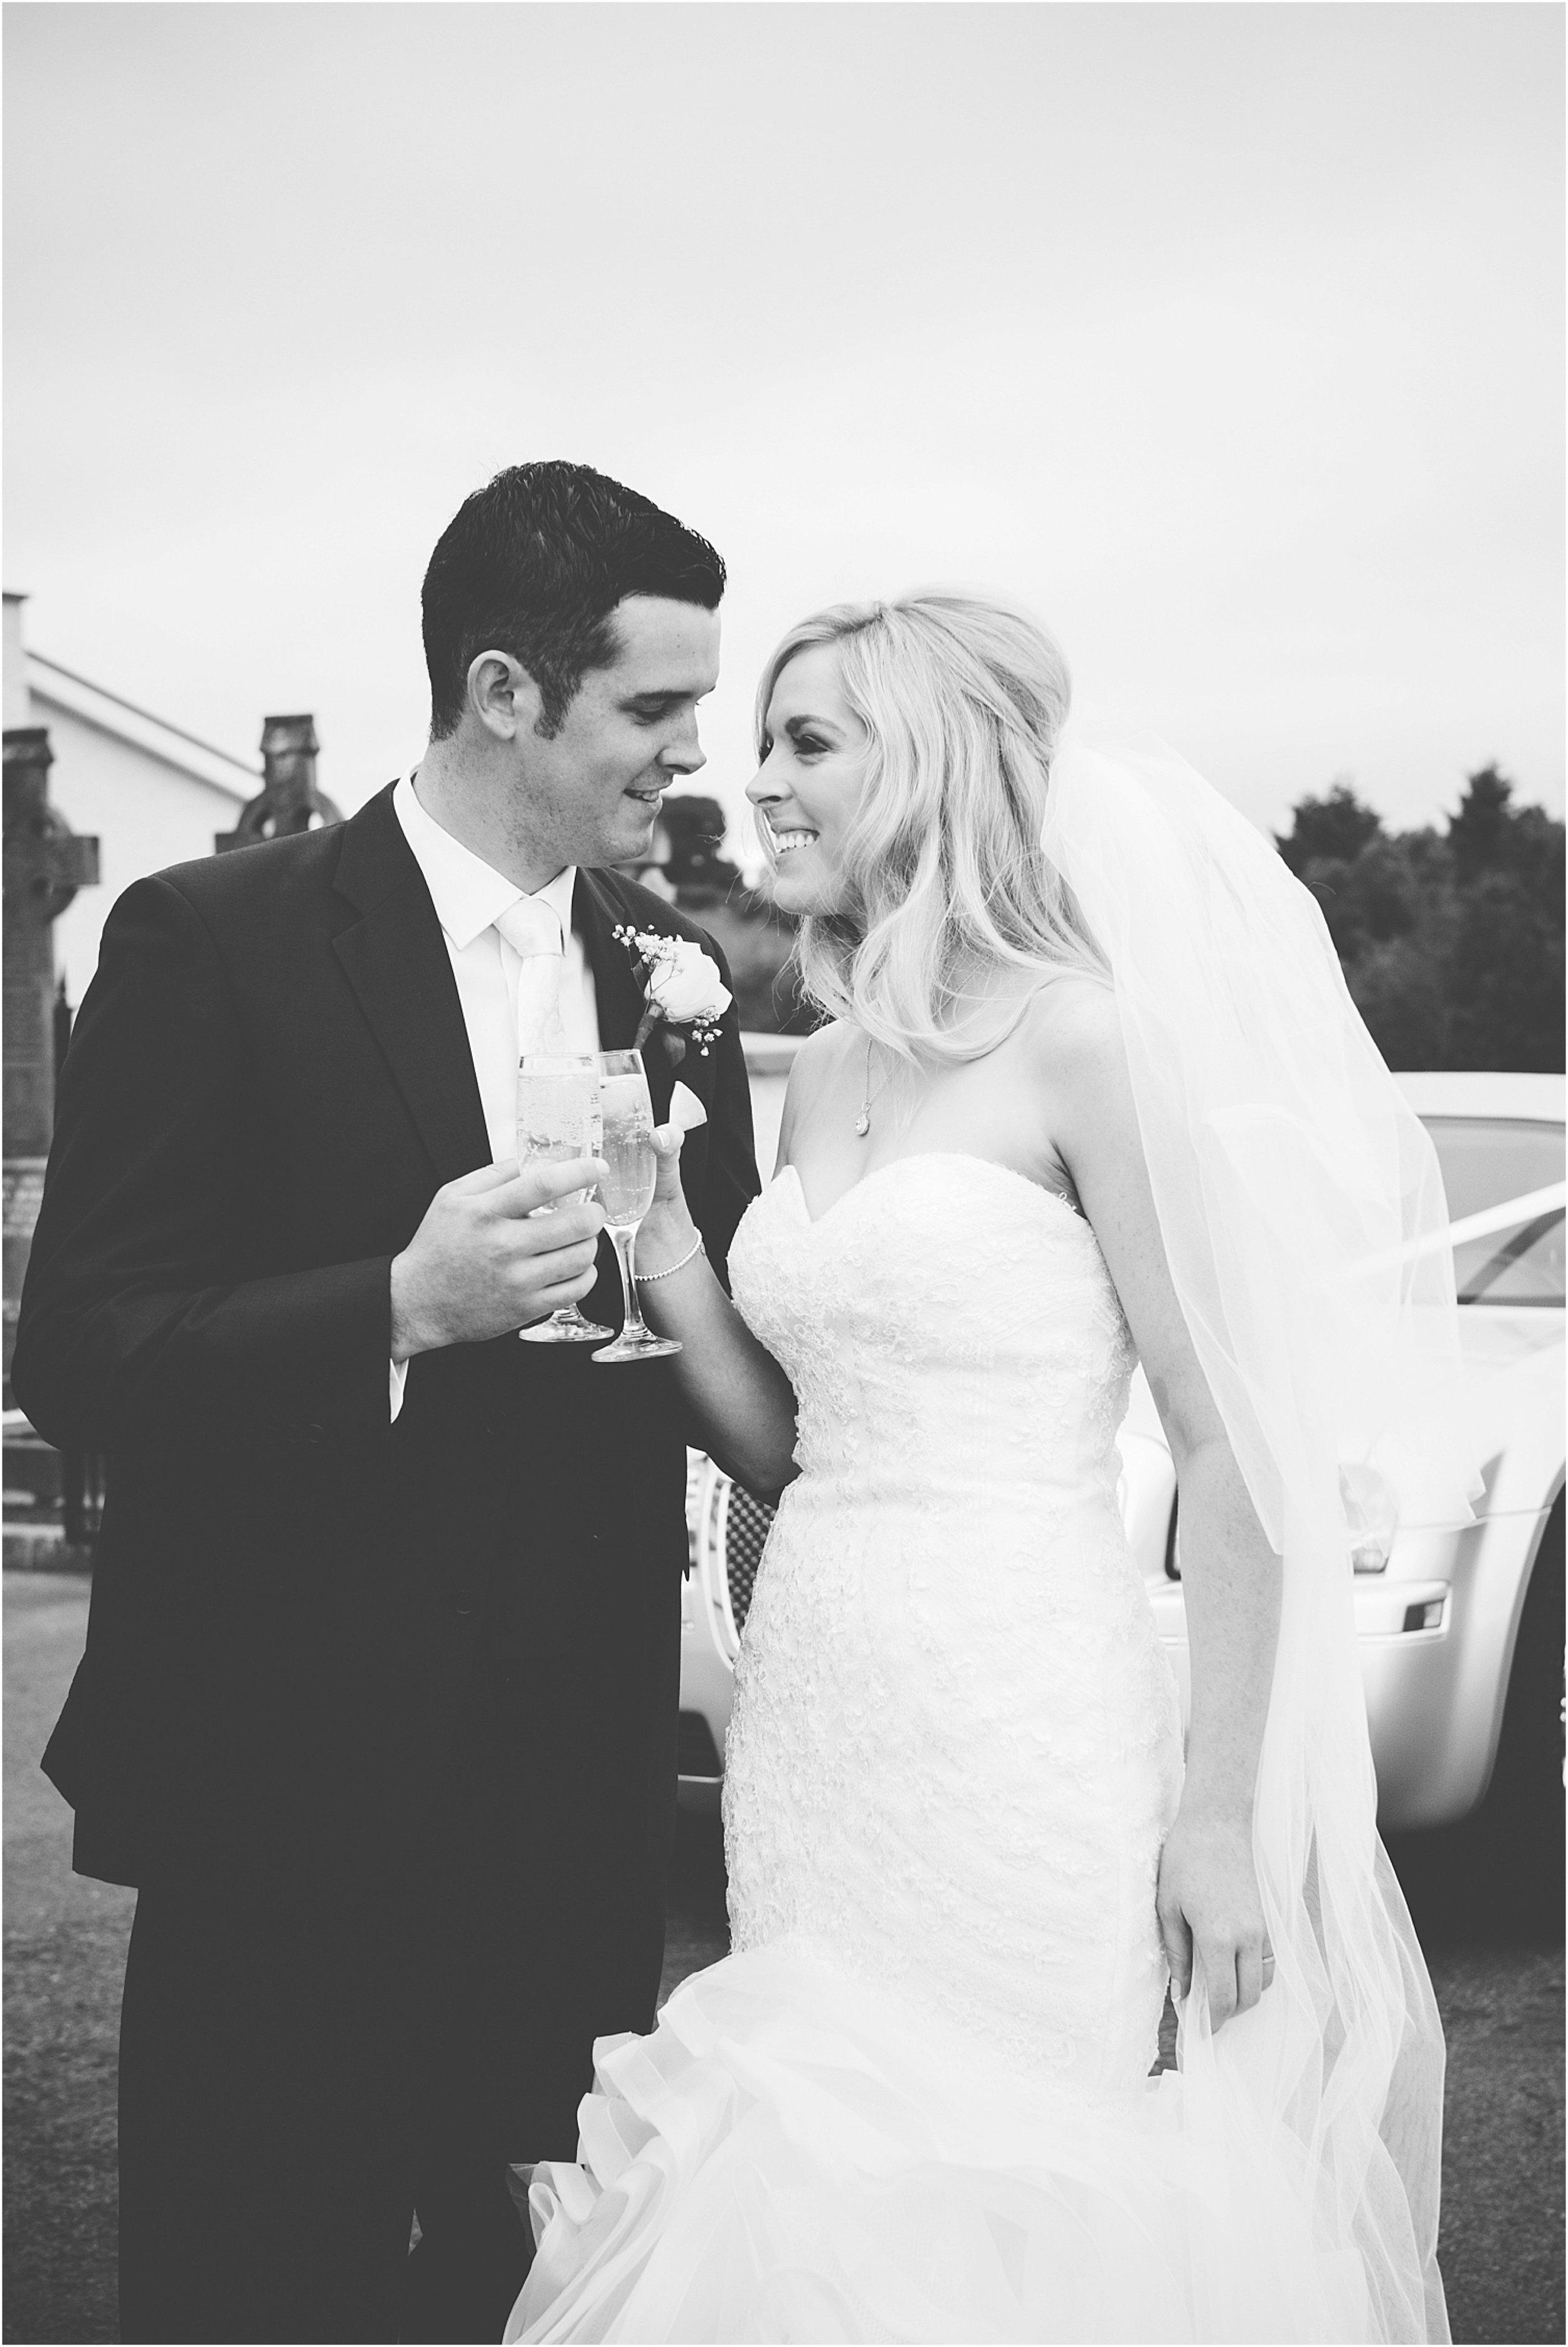 laura-lee-stephen-lough-erne-resort-wedding-photography-co-fermanagh_0042.jpg